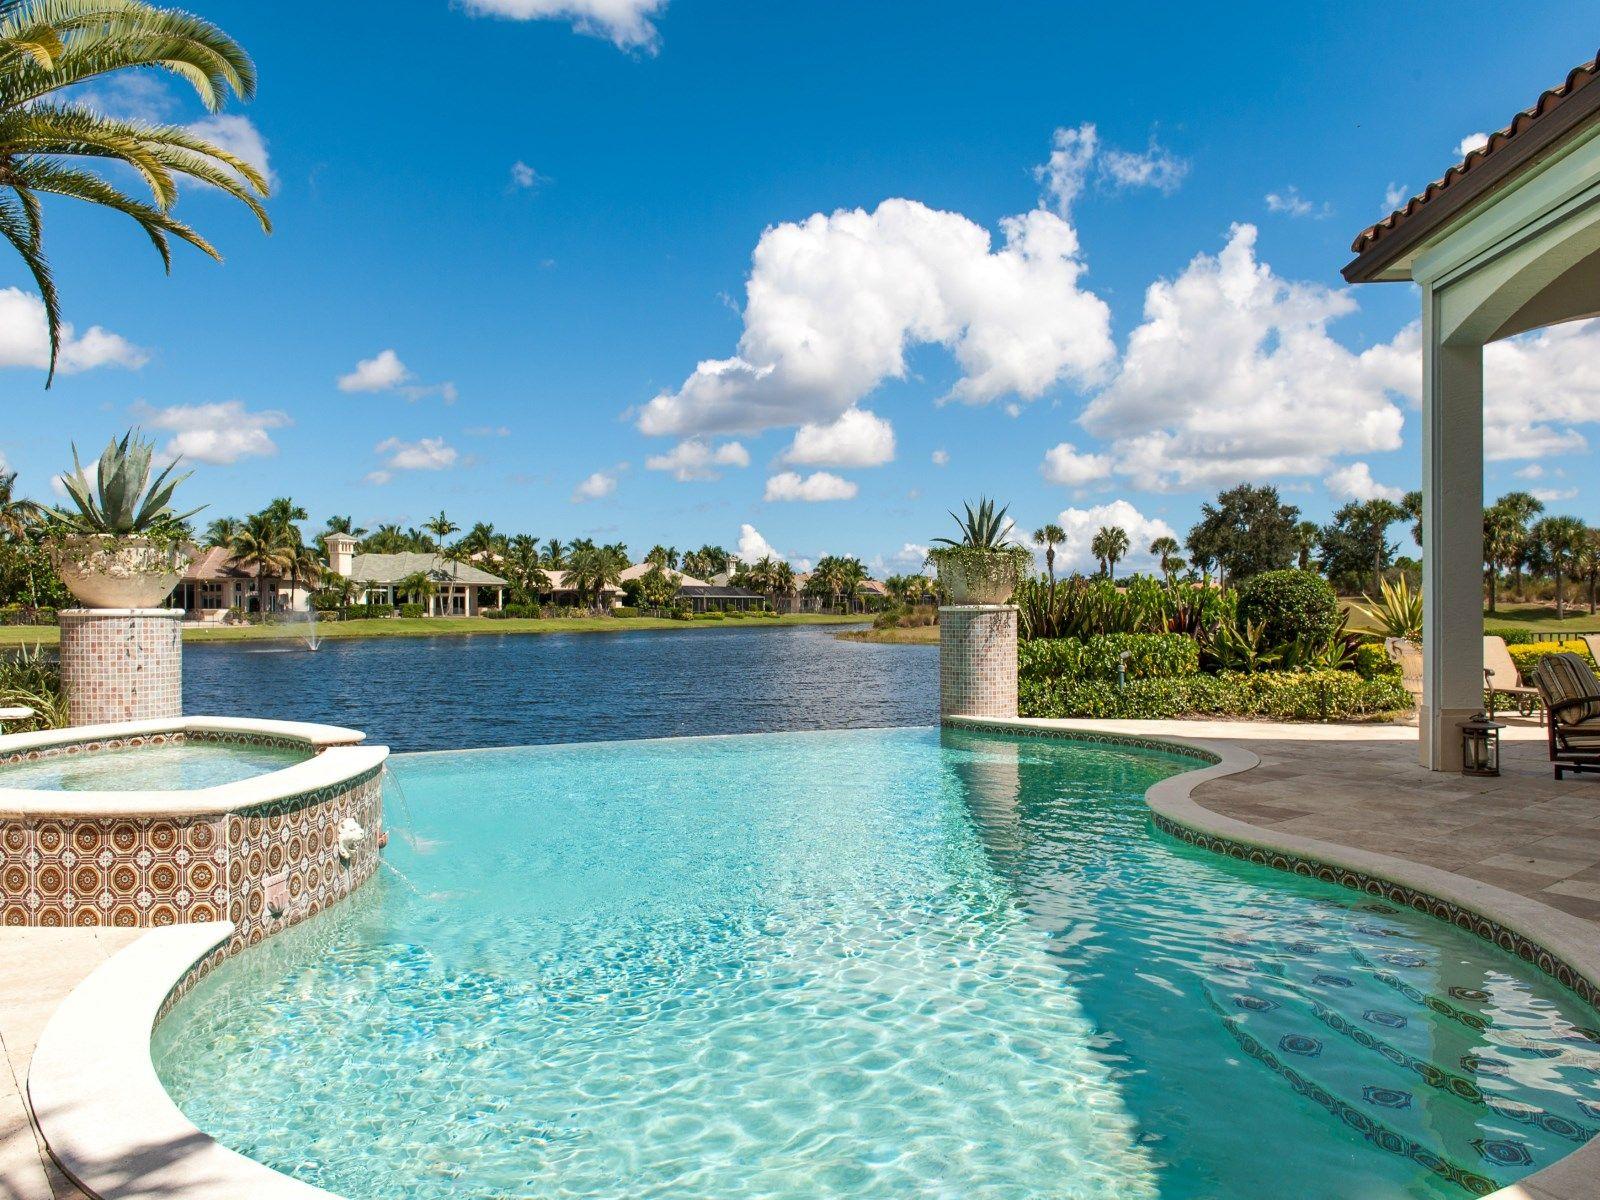 7310 Winding Bay Ln West Palm Beach, FL, 33412 Cool